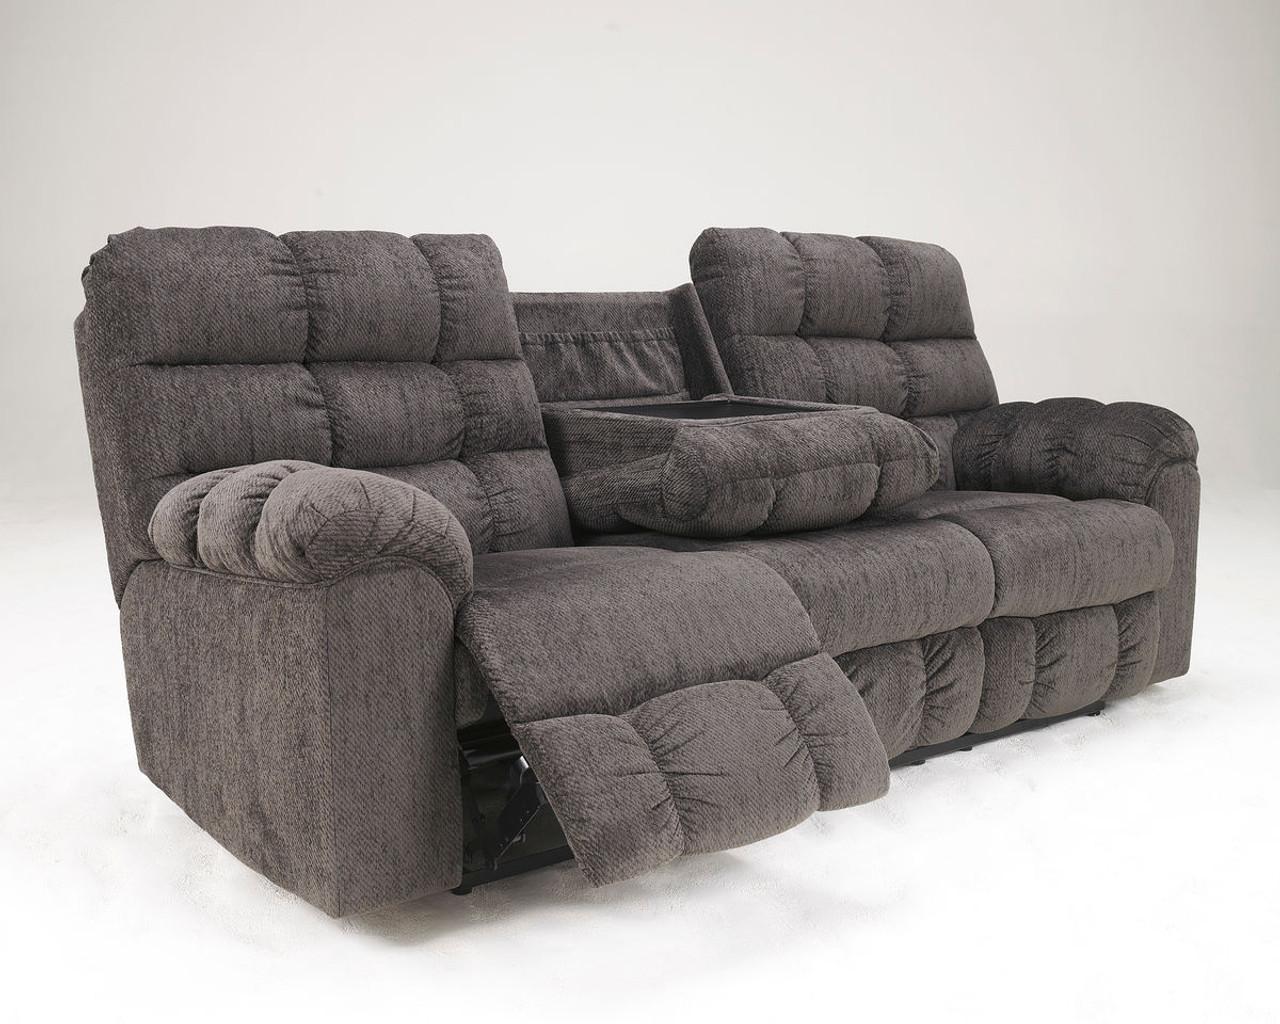 Sensational The Acieona Slate Reclining Sofa W Drop Down Table Available Machost Co Dining Chair Design Ideas Machostcouk